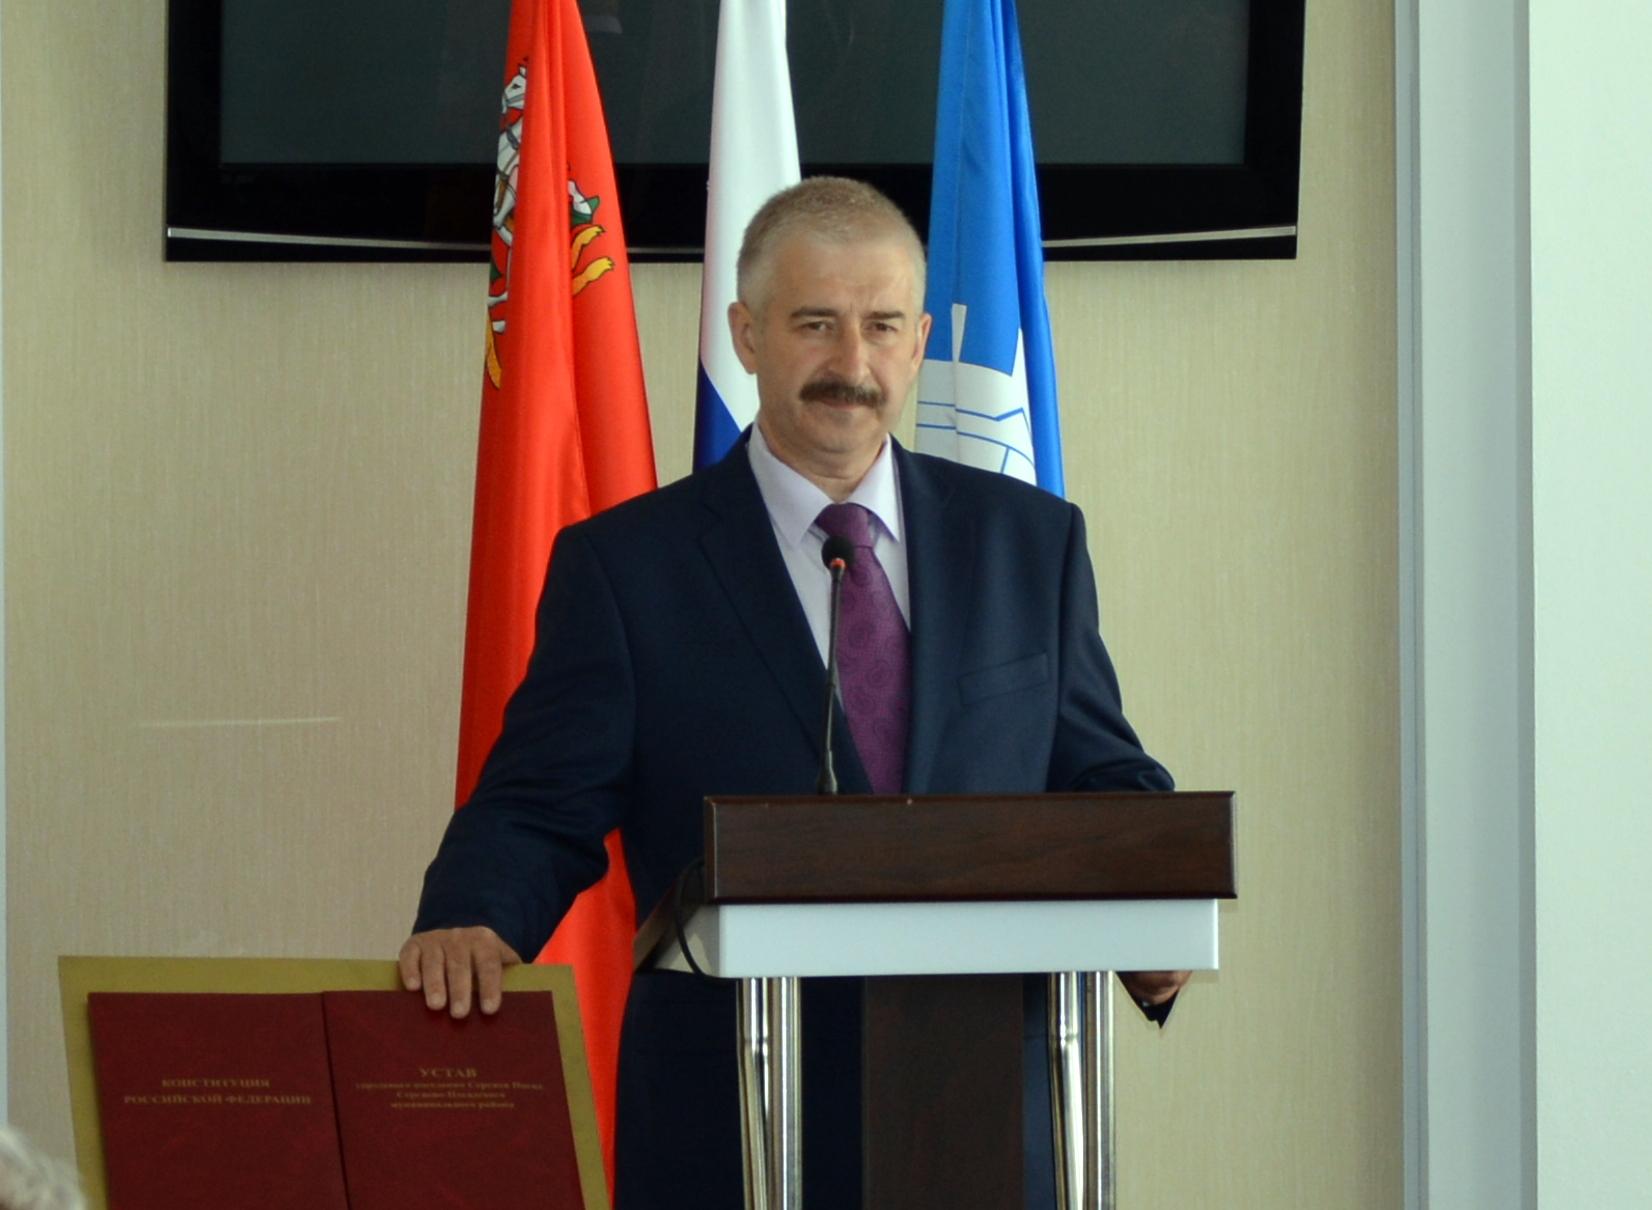 Фото: http://sergiev-posad.net/